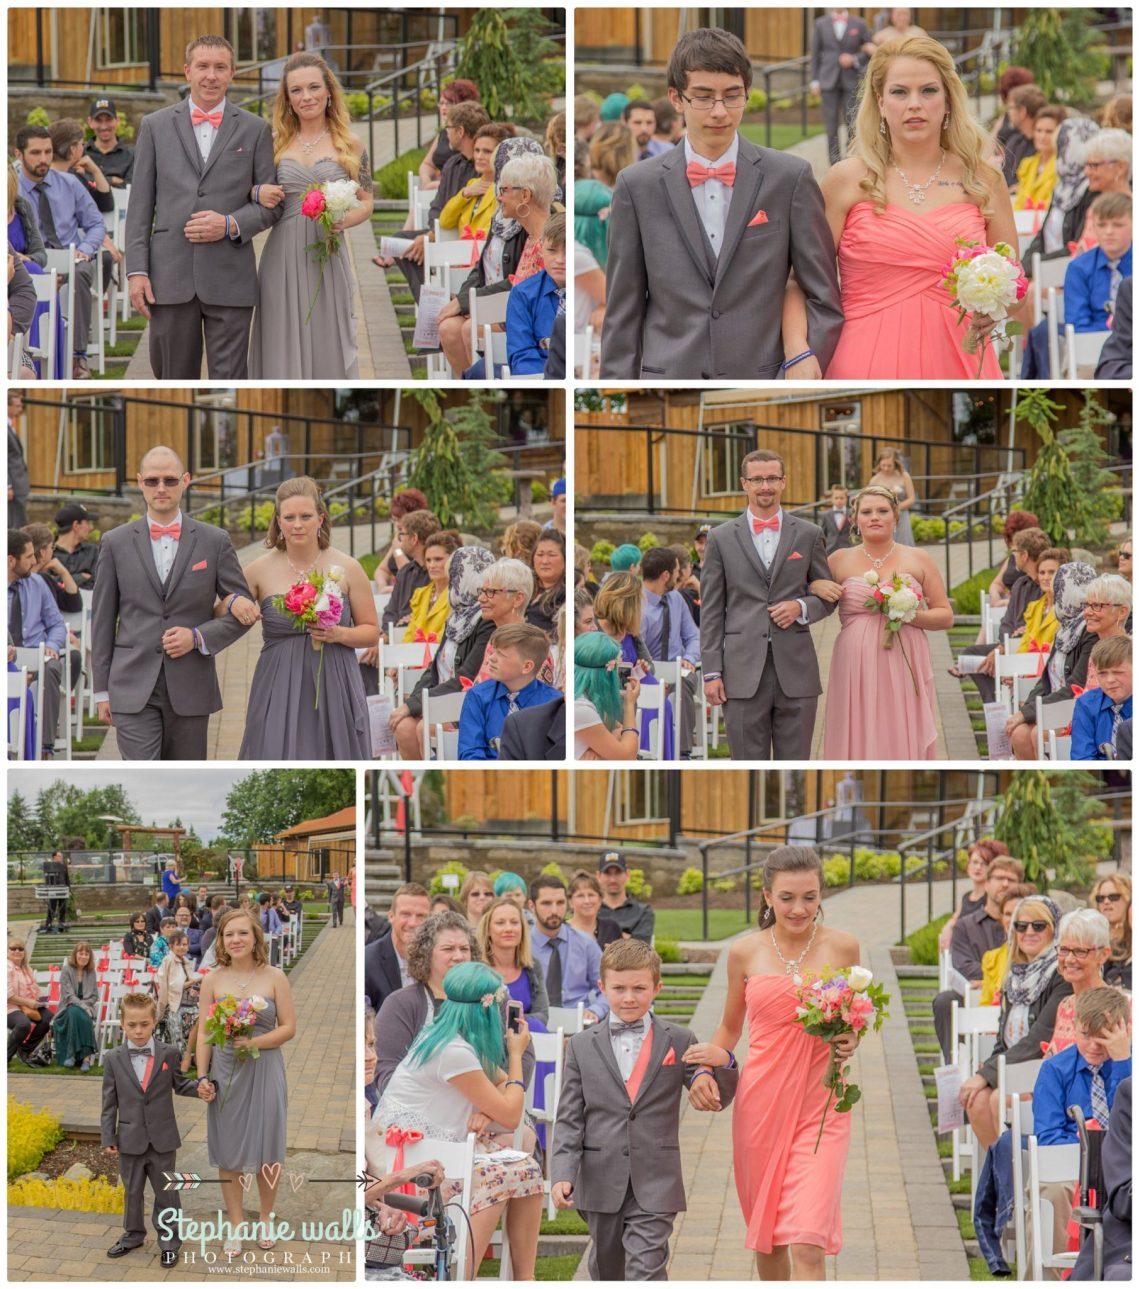 Baker Wedding 29 1 Blending Beats Together | Olympic View Estates Snohomish WA